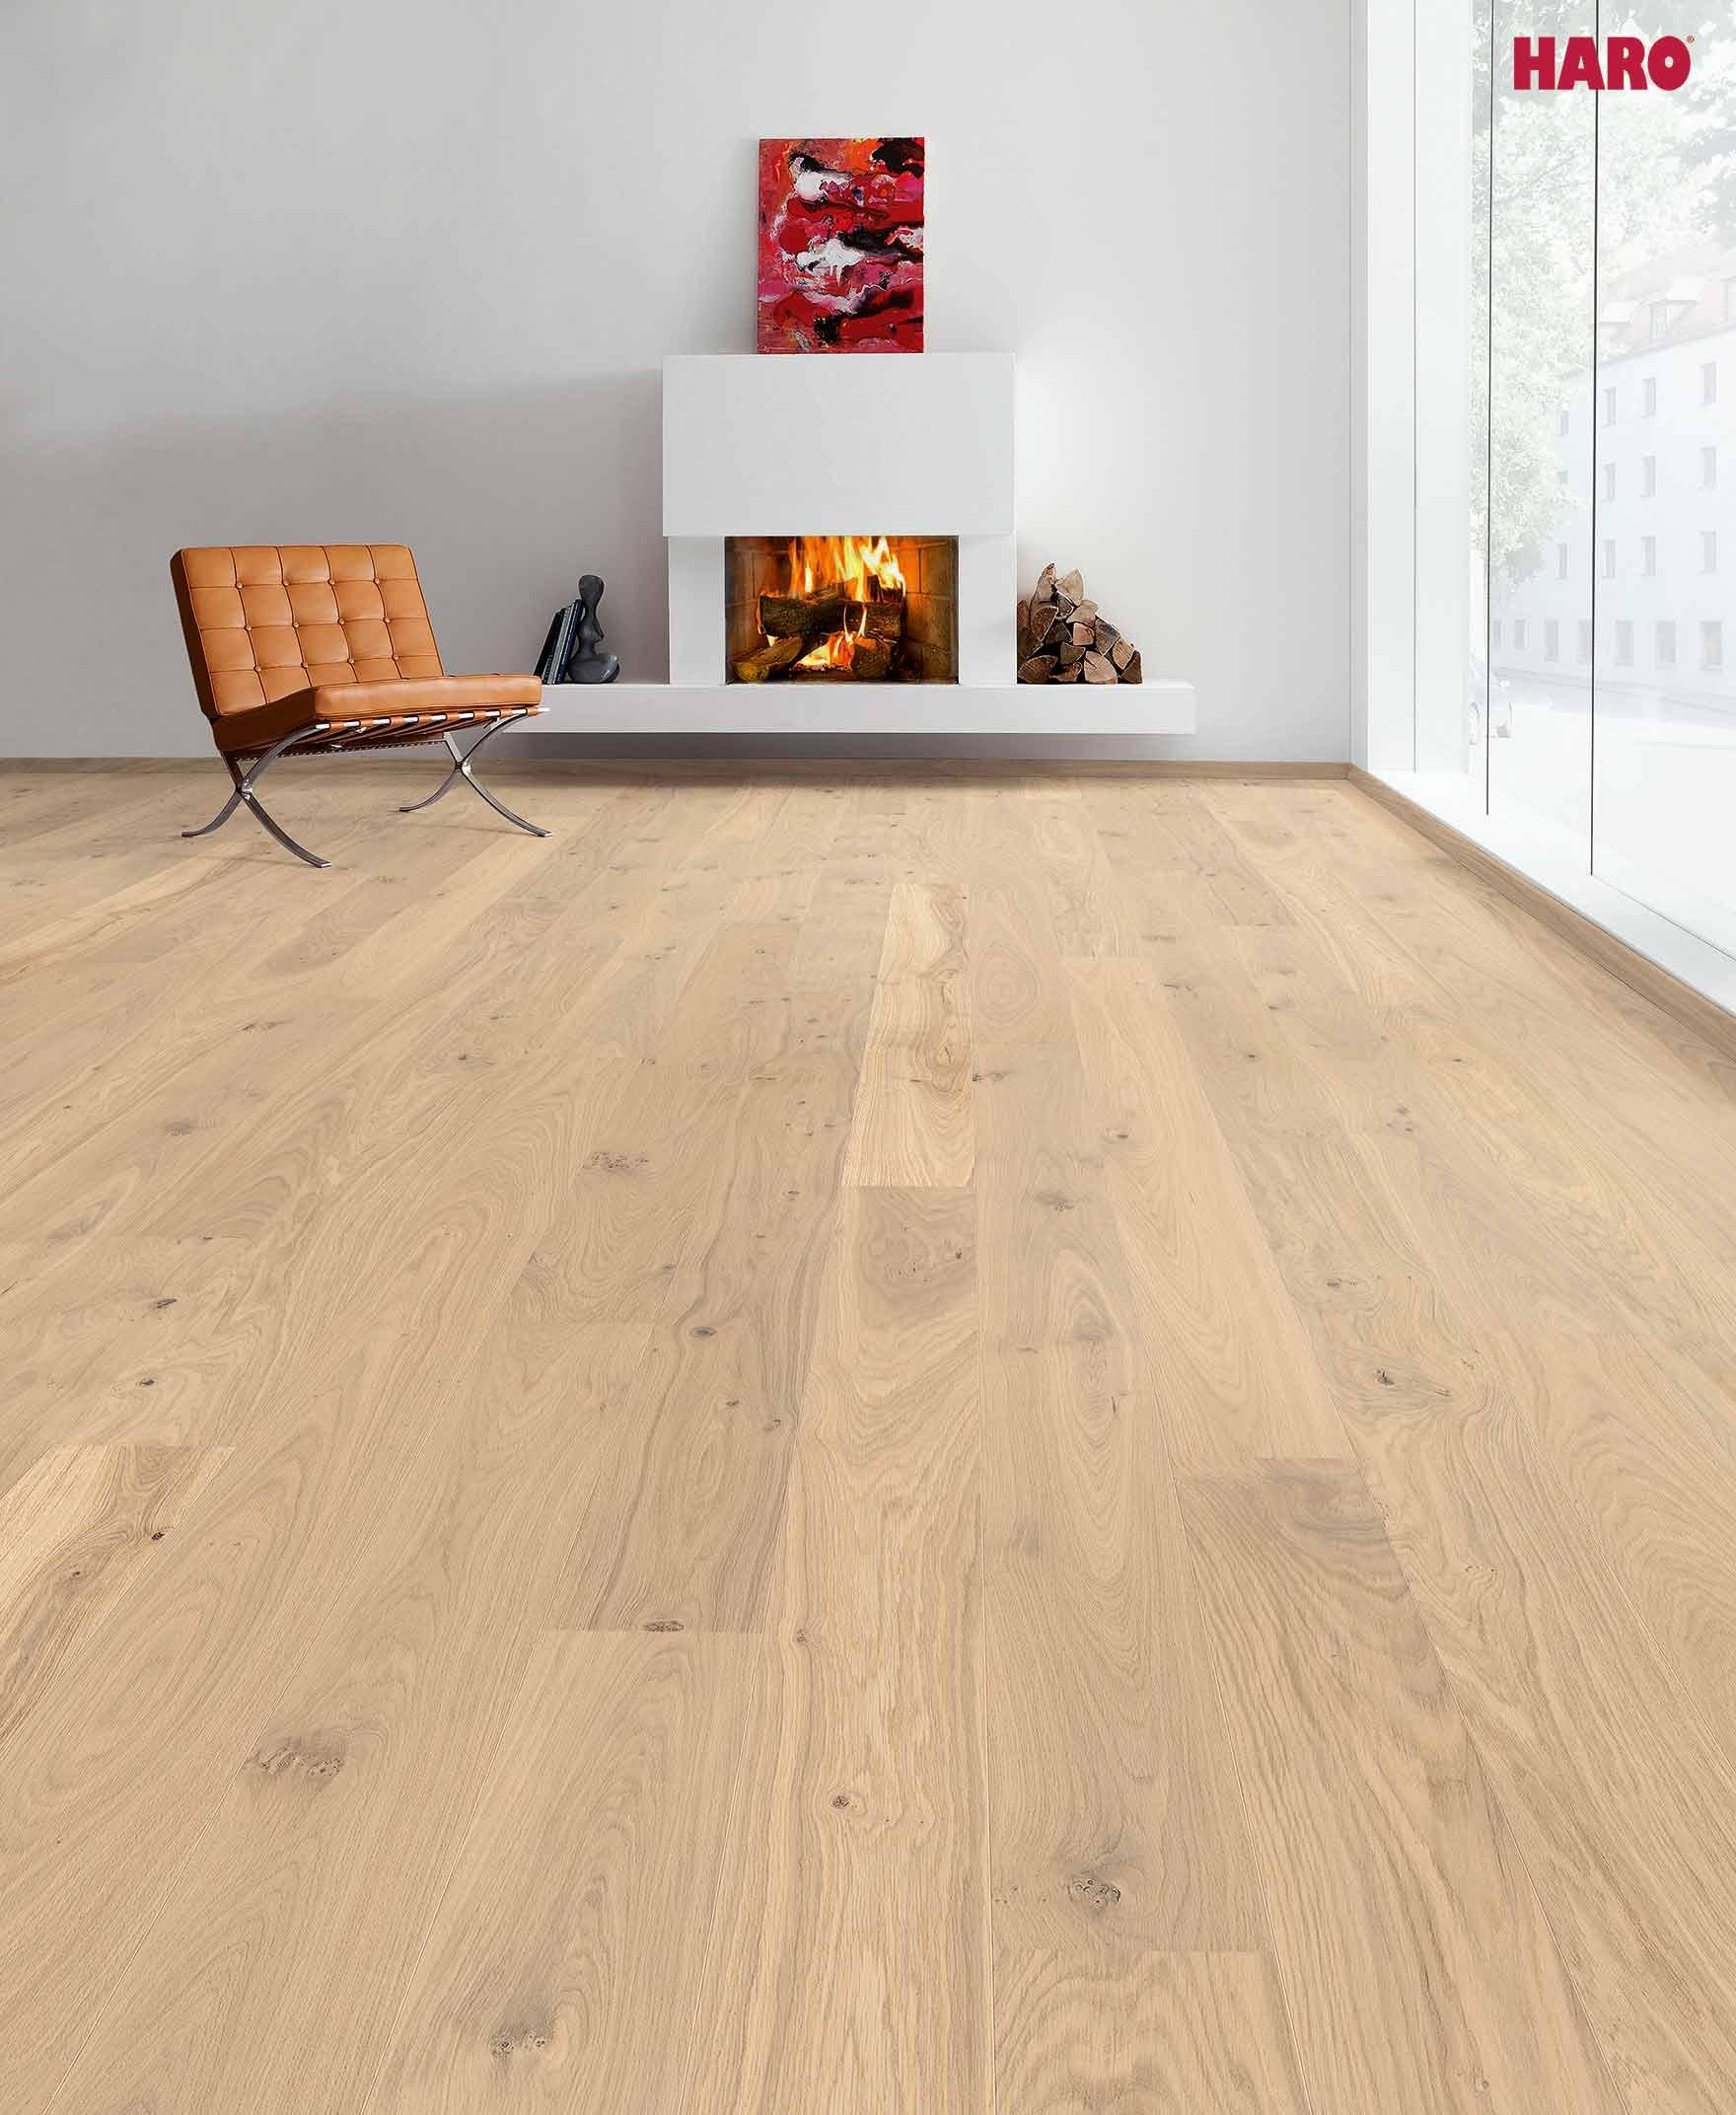 531130 parkett haro landhausdiele 3000 eiche alabama strukturiert lackiert 2v micro fase. Black Bedroom Furniture Sets. Home Design Ideas